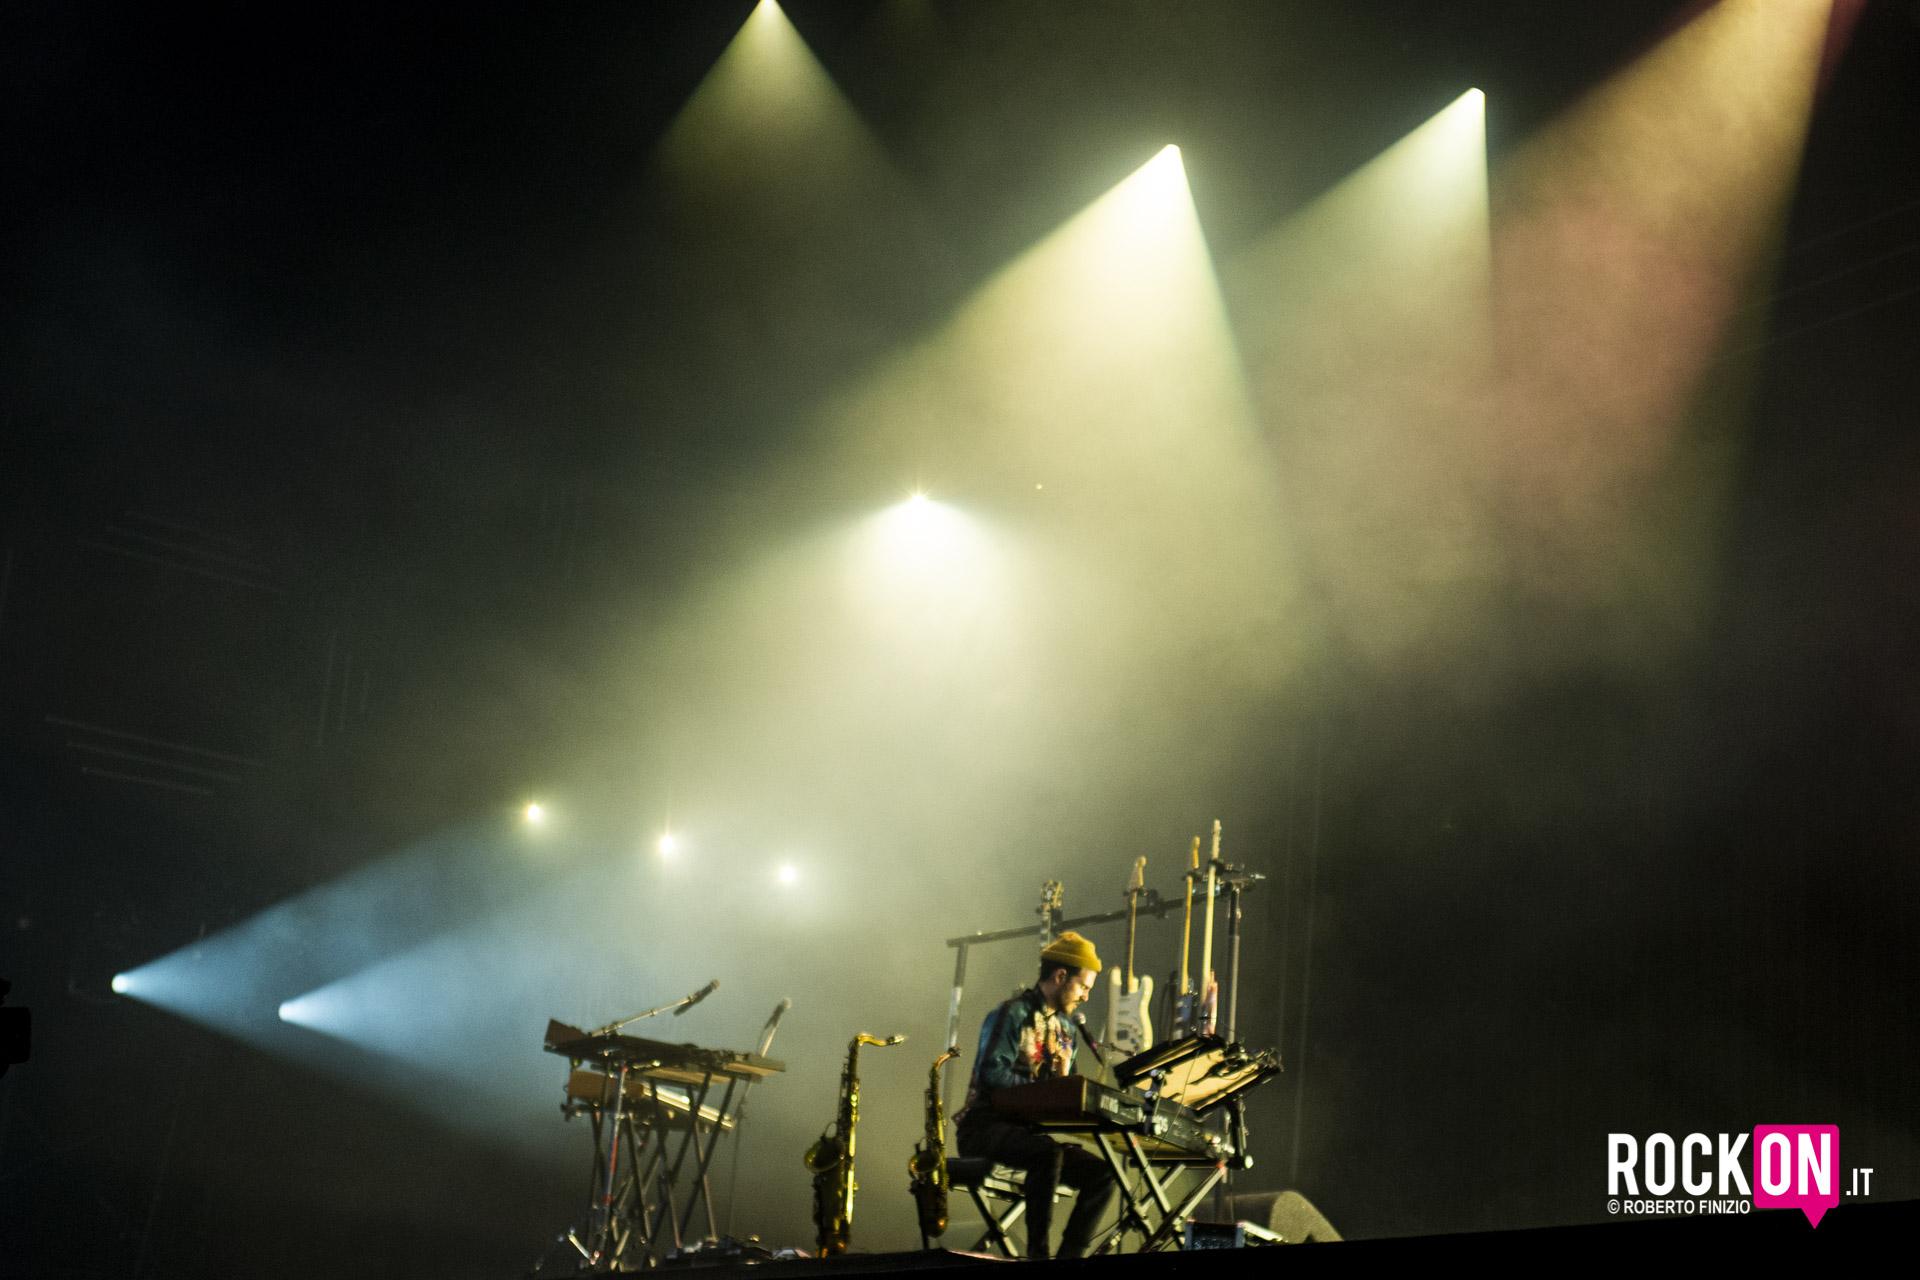 rockon-FKJ-lowlands-festival-netherlands-music-concert-roberto-finizio-16-august-2019-50